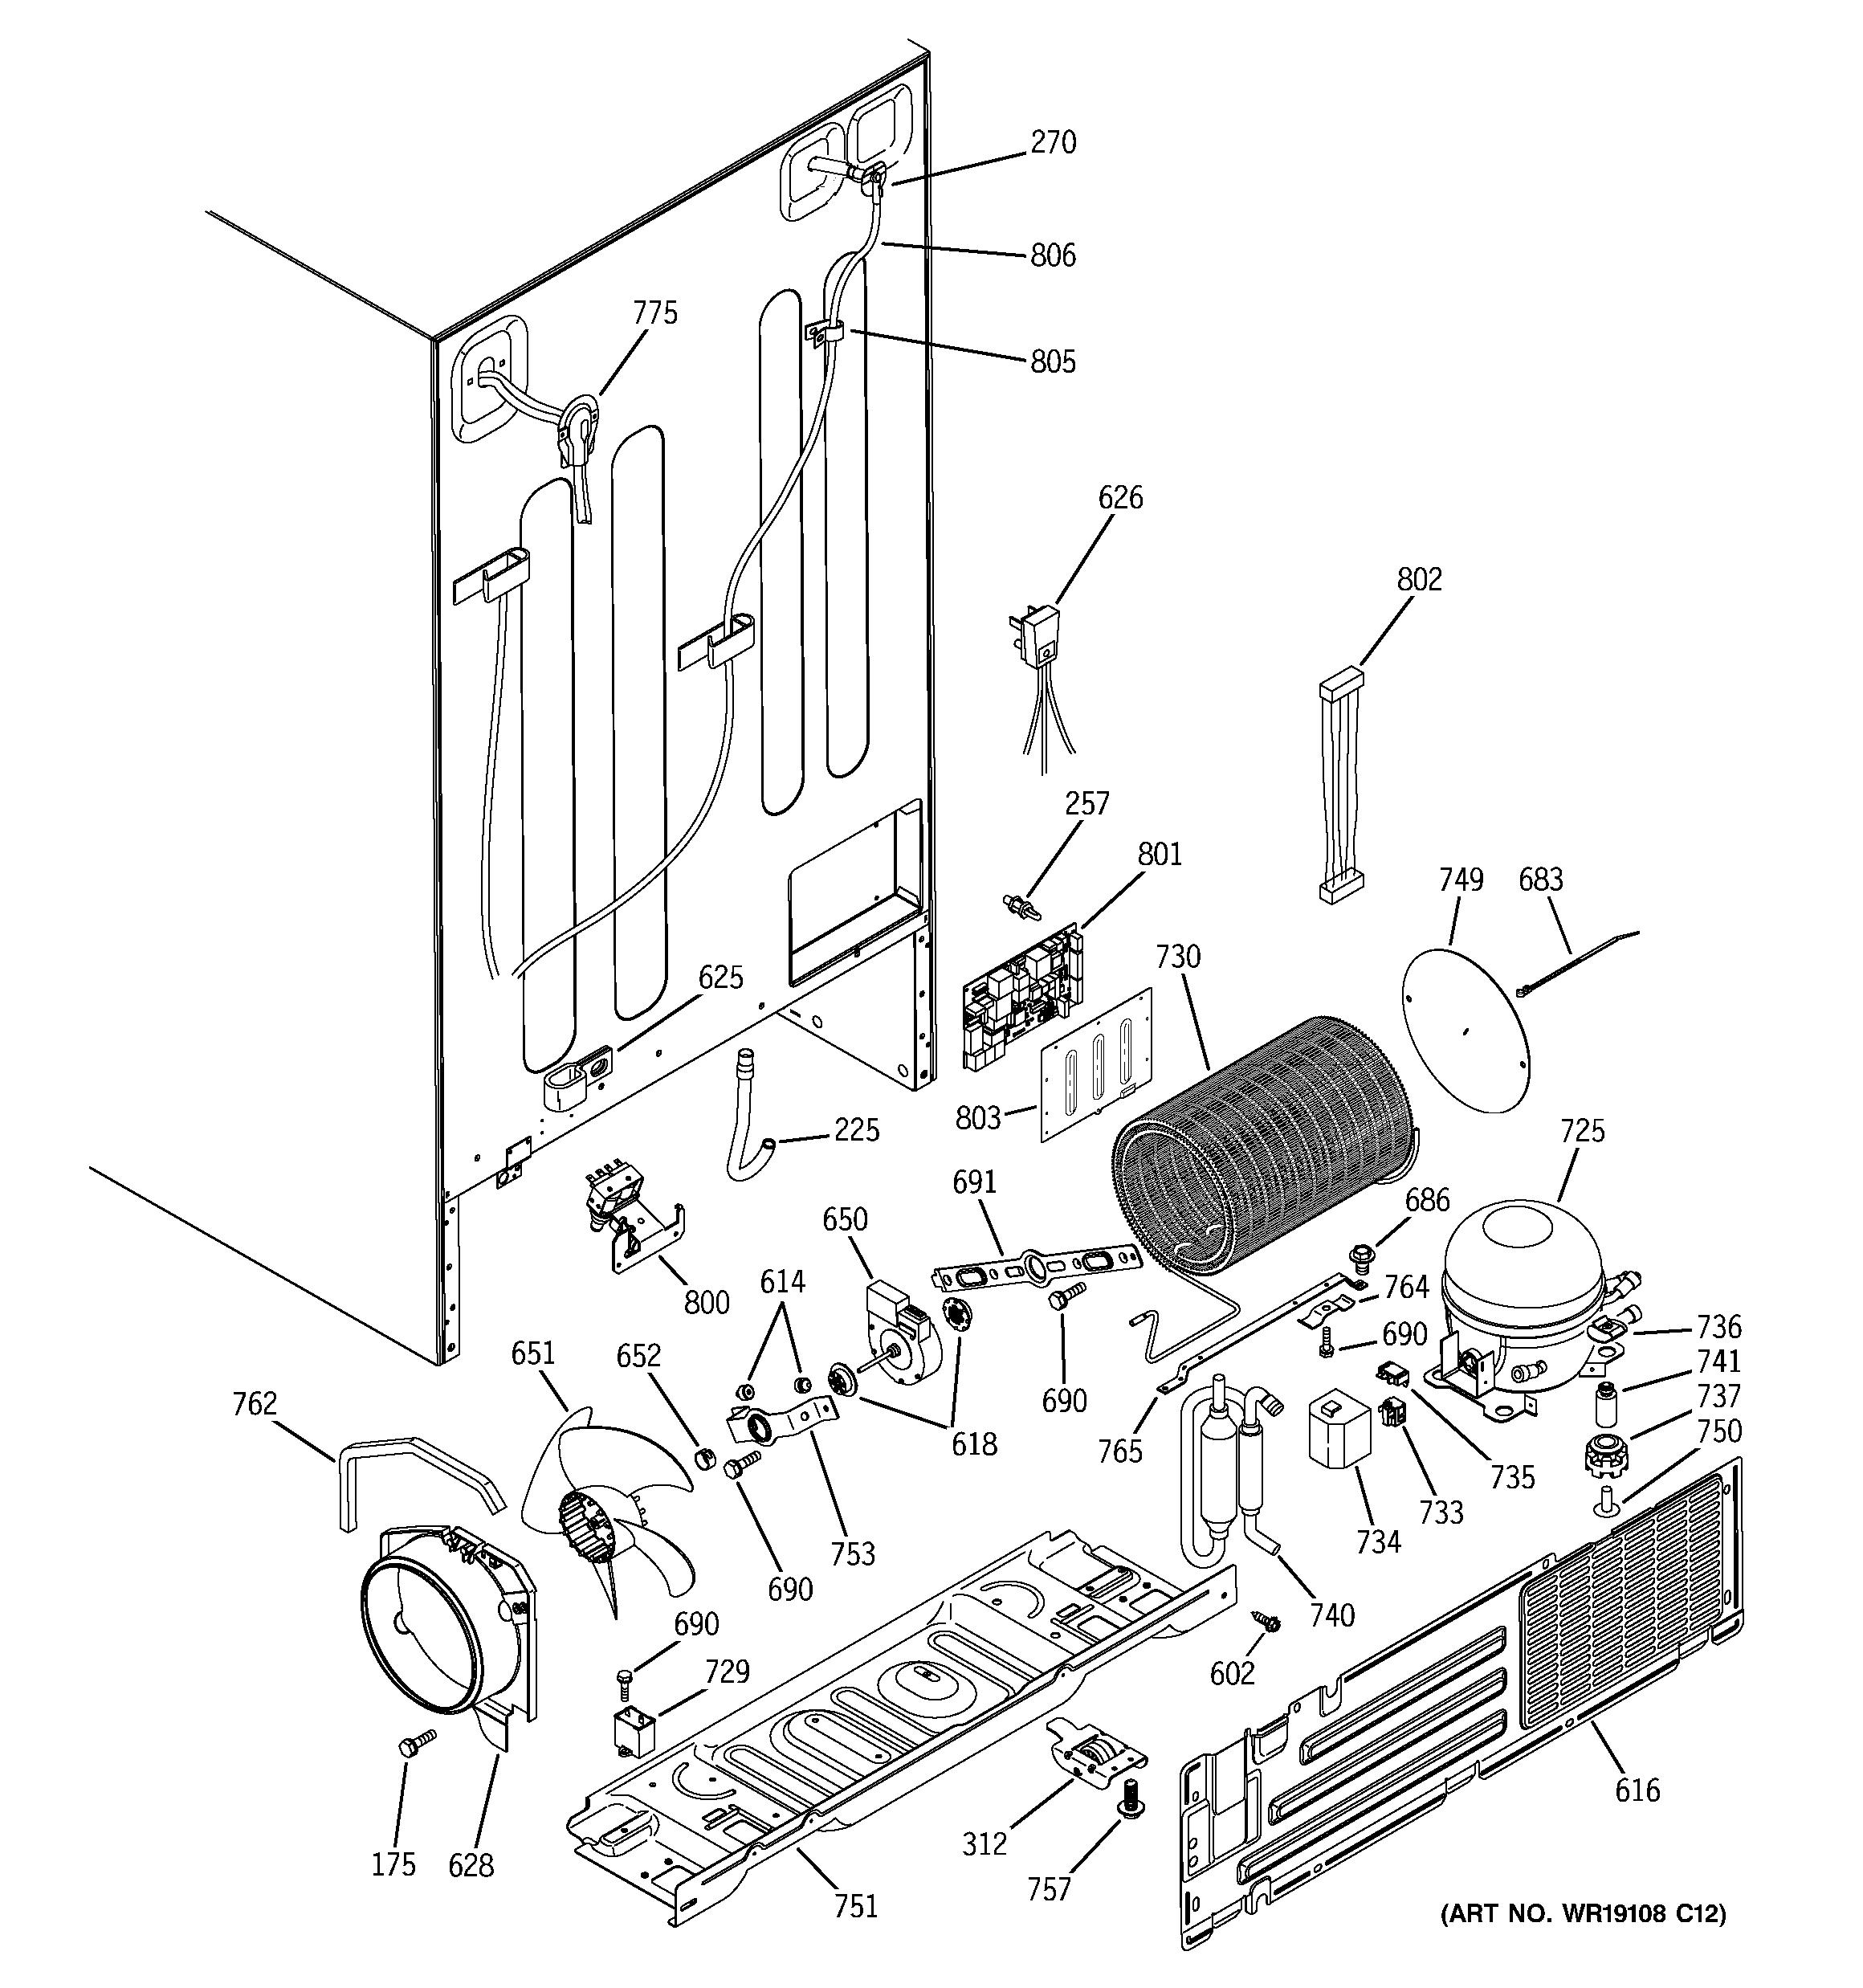 XT_4144] By Side Refrigerator Parts Diagram On Ge Refrigerator Wiring  Diagram Free Diagram | Ge Refrigerator Wire Diagram |  | Nful Drosi Waro Rosz Nful Phae Mohammedshrine Librar Wiring 101